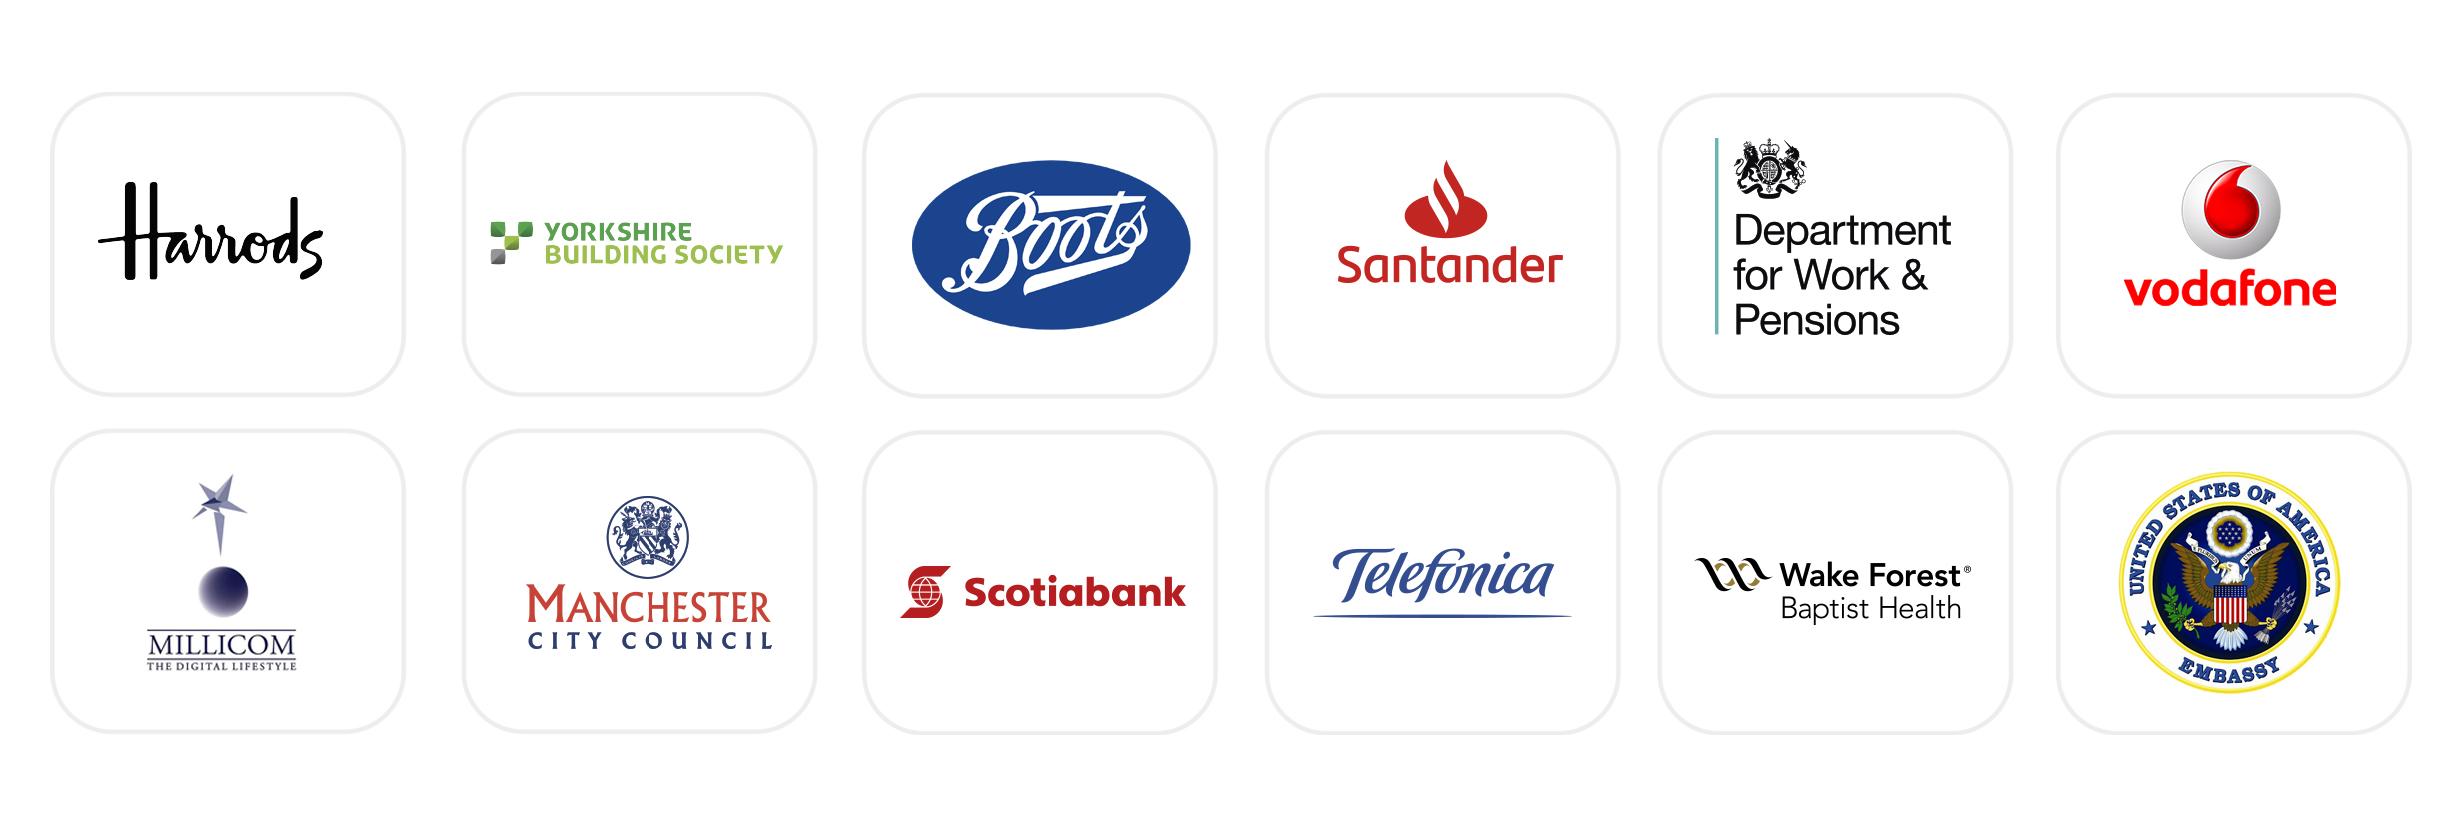 Banner Iconos logos1.jpg